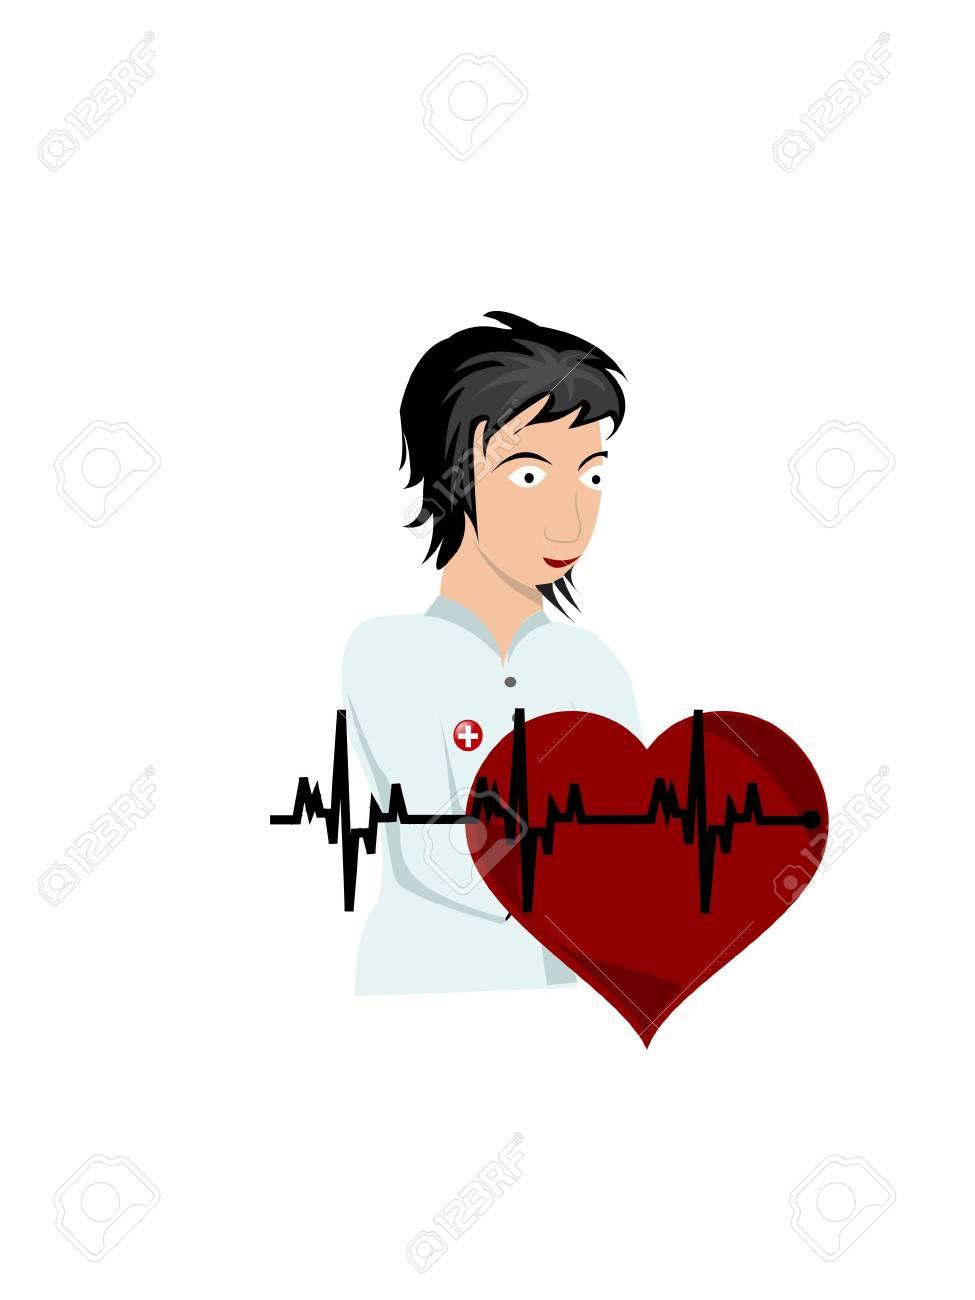 nurse and heartbeats on isolated background Stock Photo - 3307570